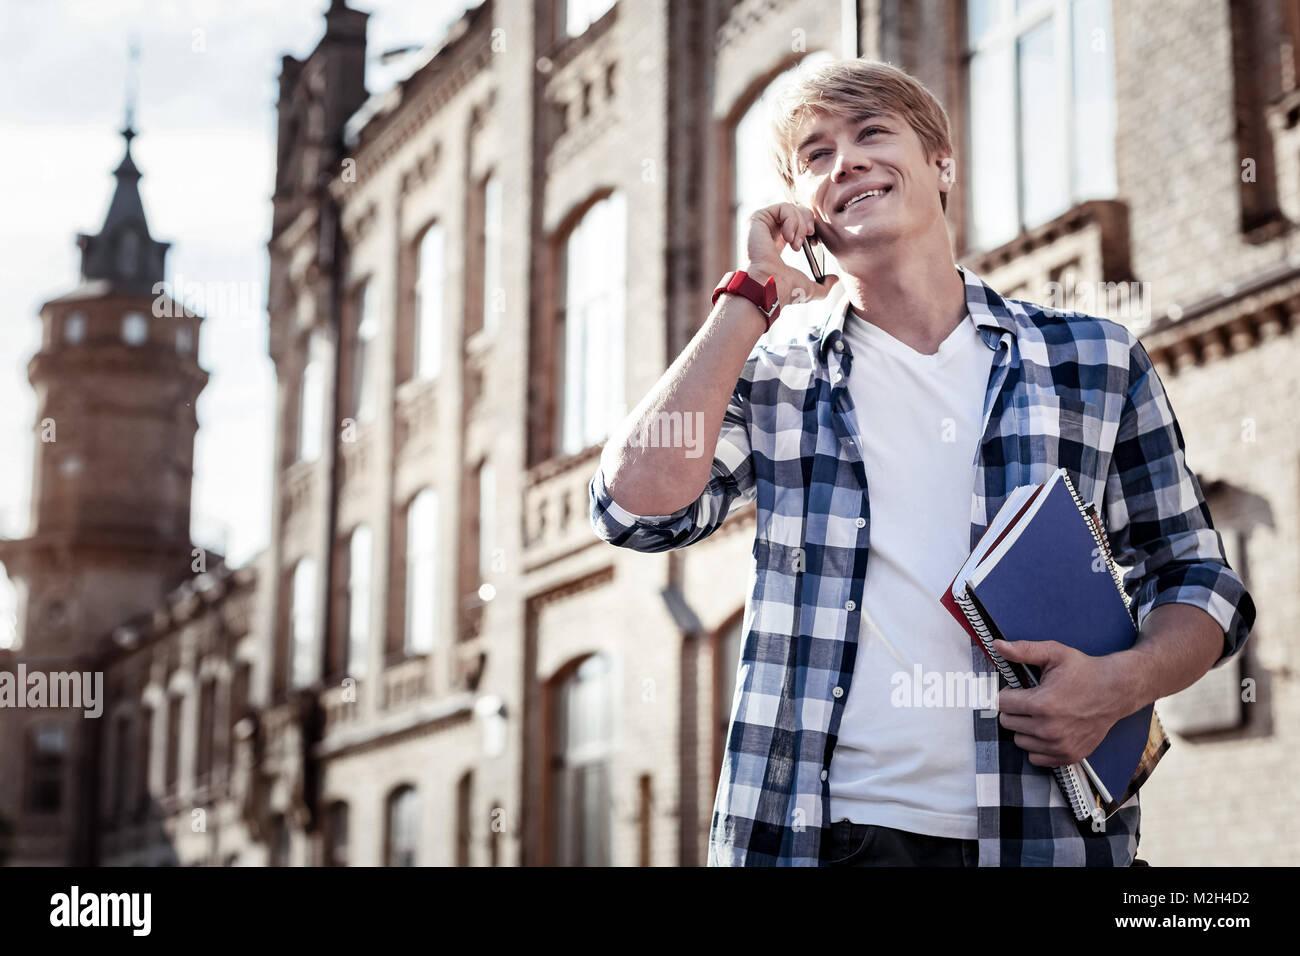 Joyful positive student sharing news - Stock Image